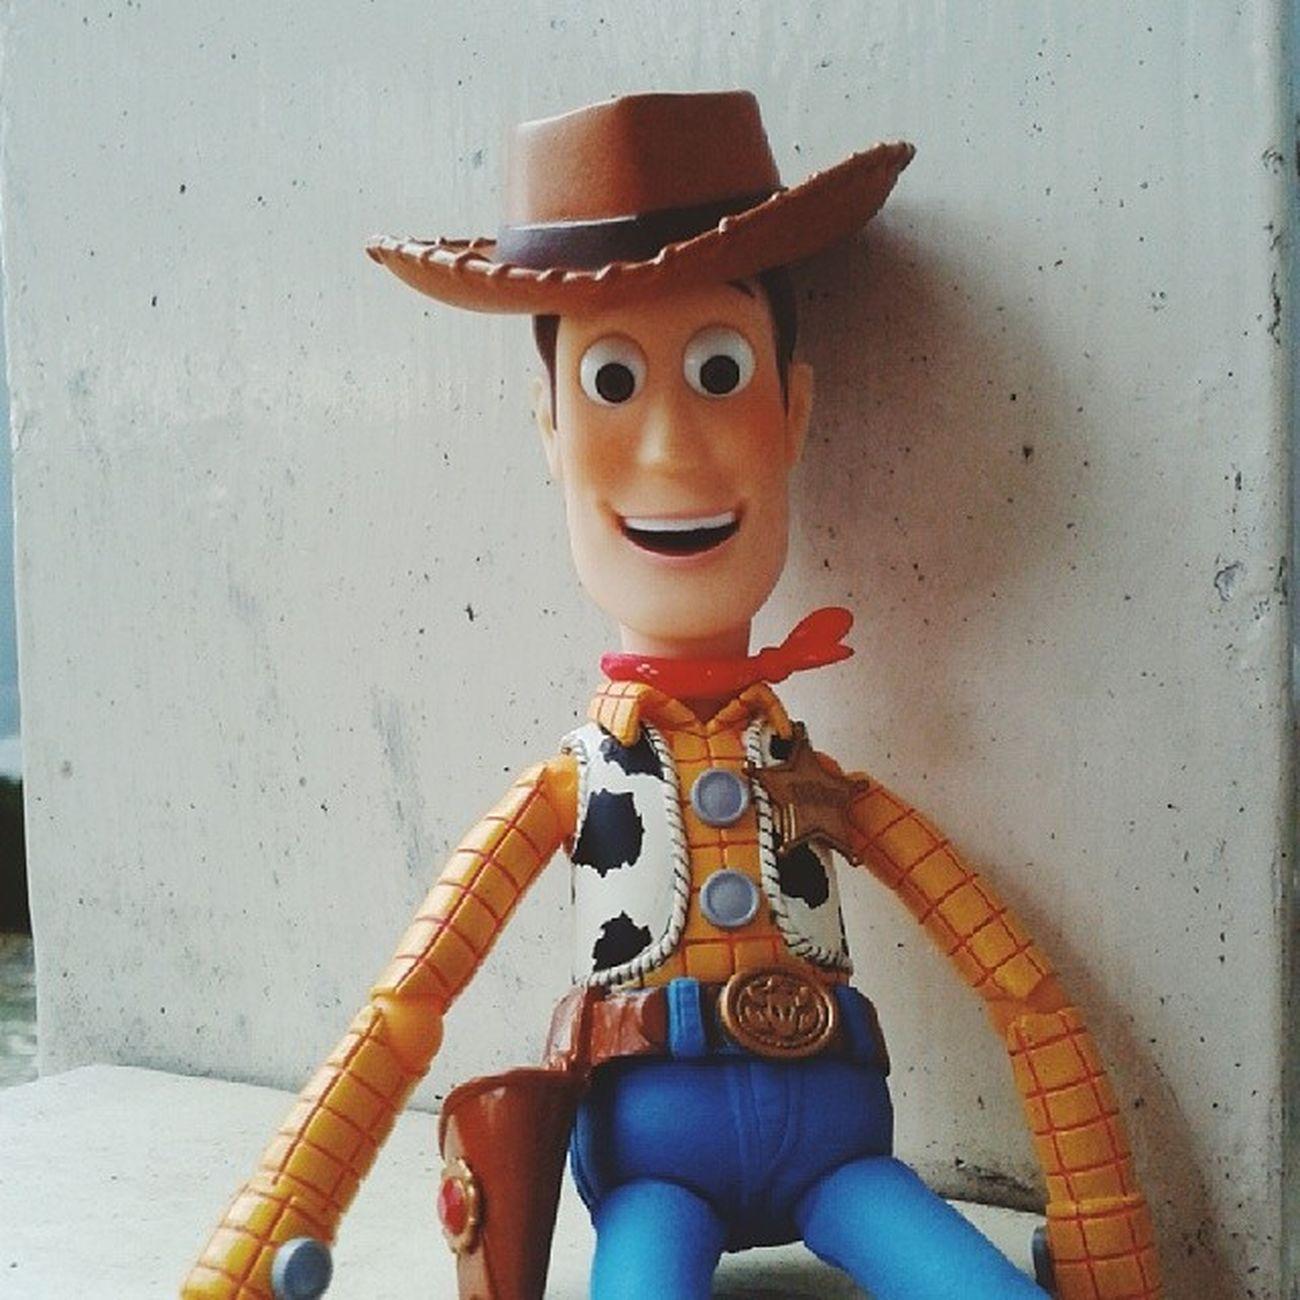 Woody says hello.. Woody Toystory Pixar  Love TagsForLikes TFLers tweegram photooftheday 20likes amazing followme follow4follow like4like look instalike igers picoftheday food instadaily instafollow like girl iphoneonly instagood bestoftheday instacool instago all_shots follow webstagram